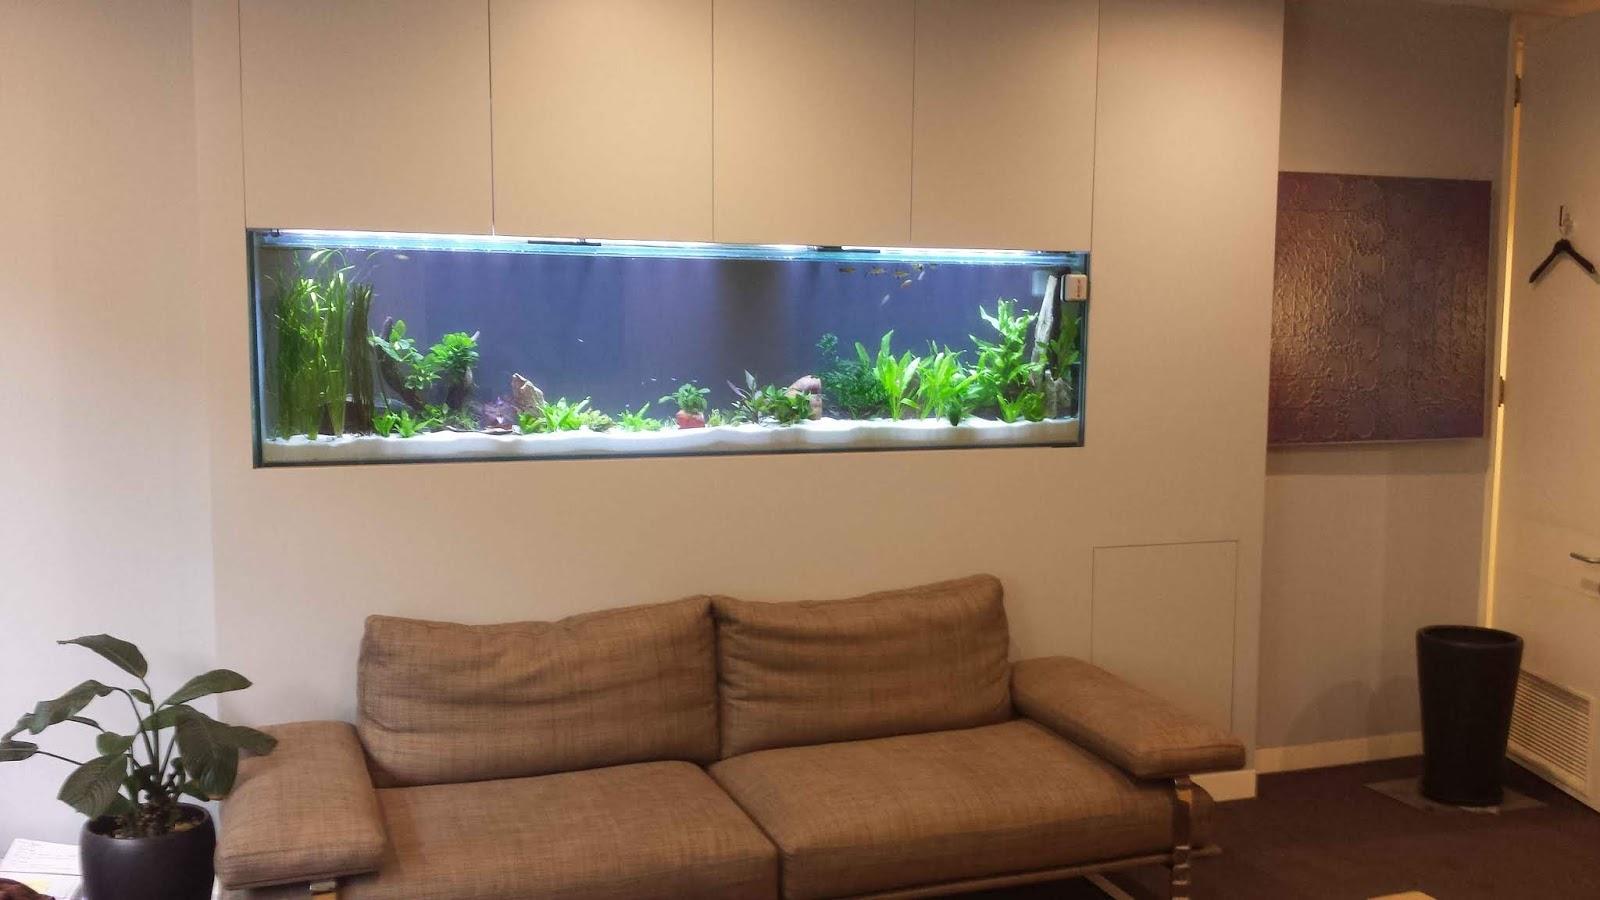 46 Desain Aquarium Cantik Dan Unik Anti Mainstream Rumahku Unik Macam macam bentuk aquarium